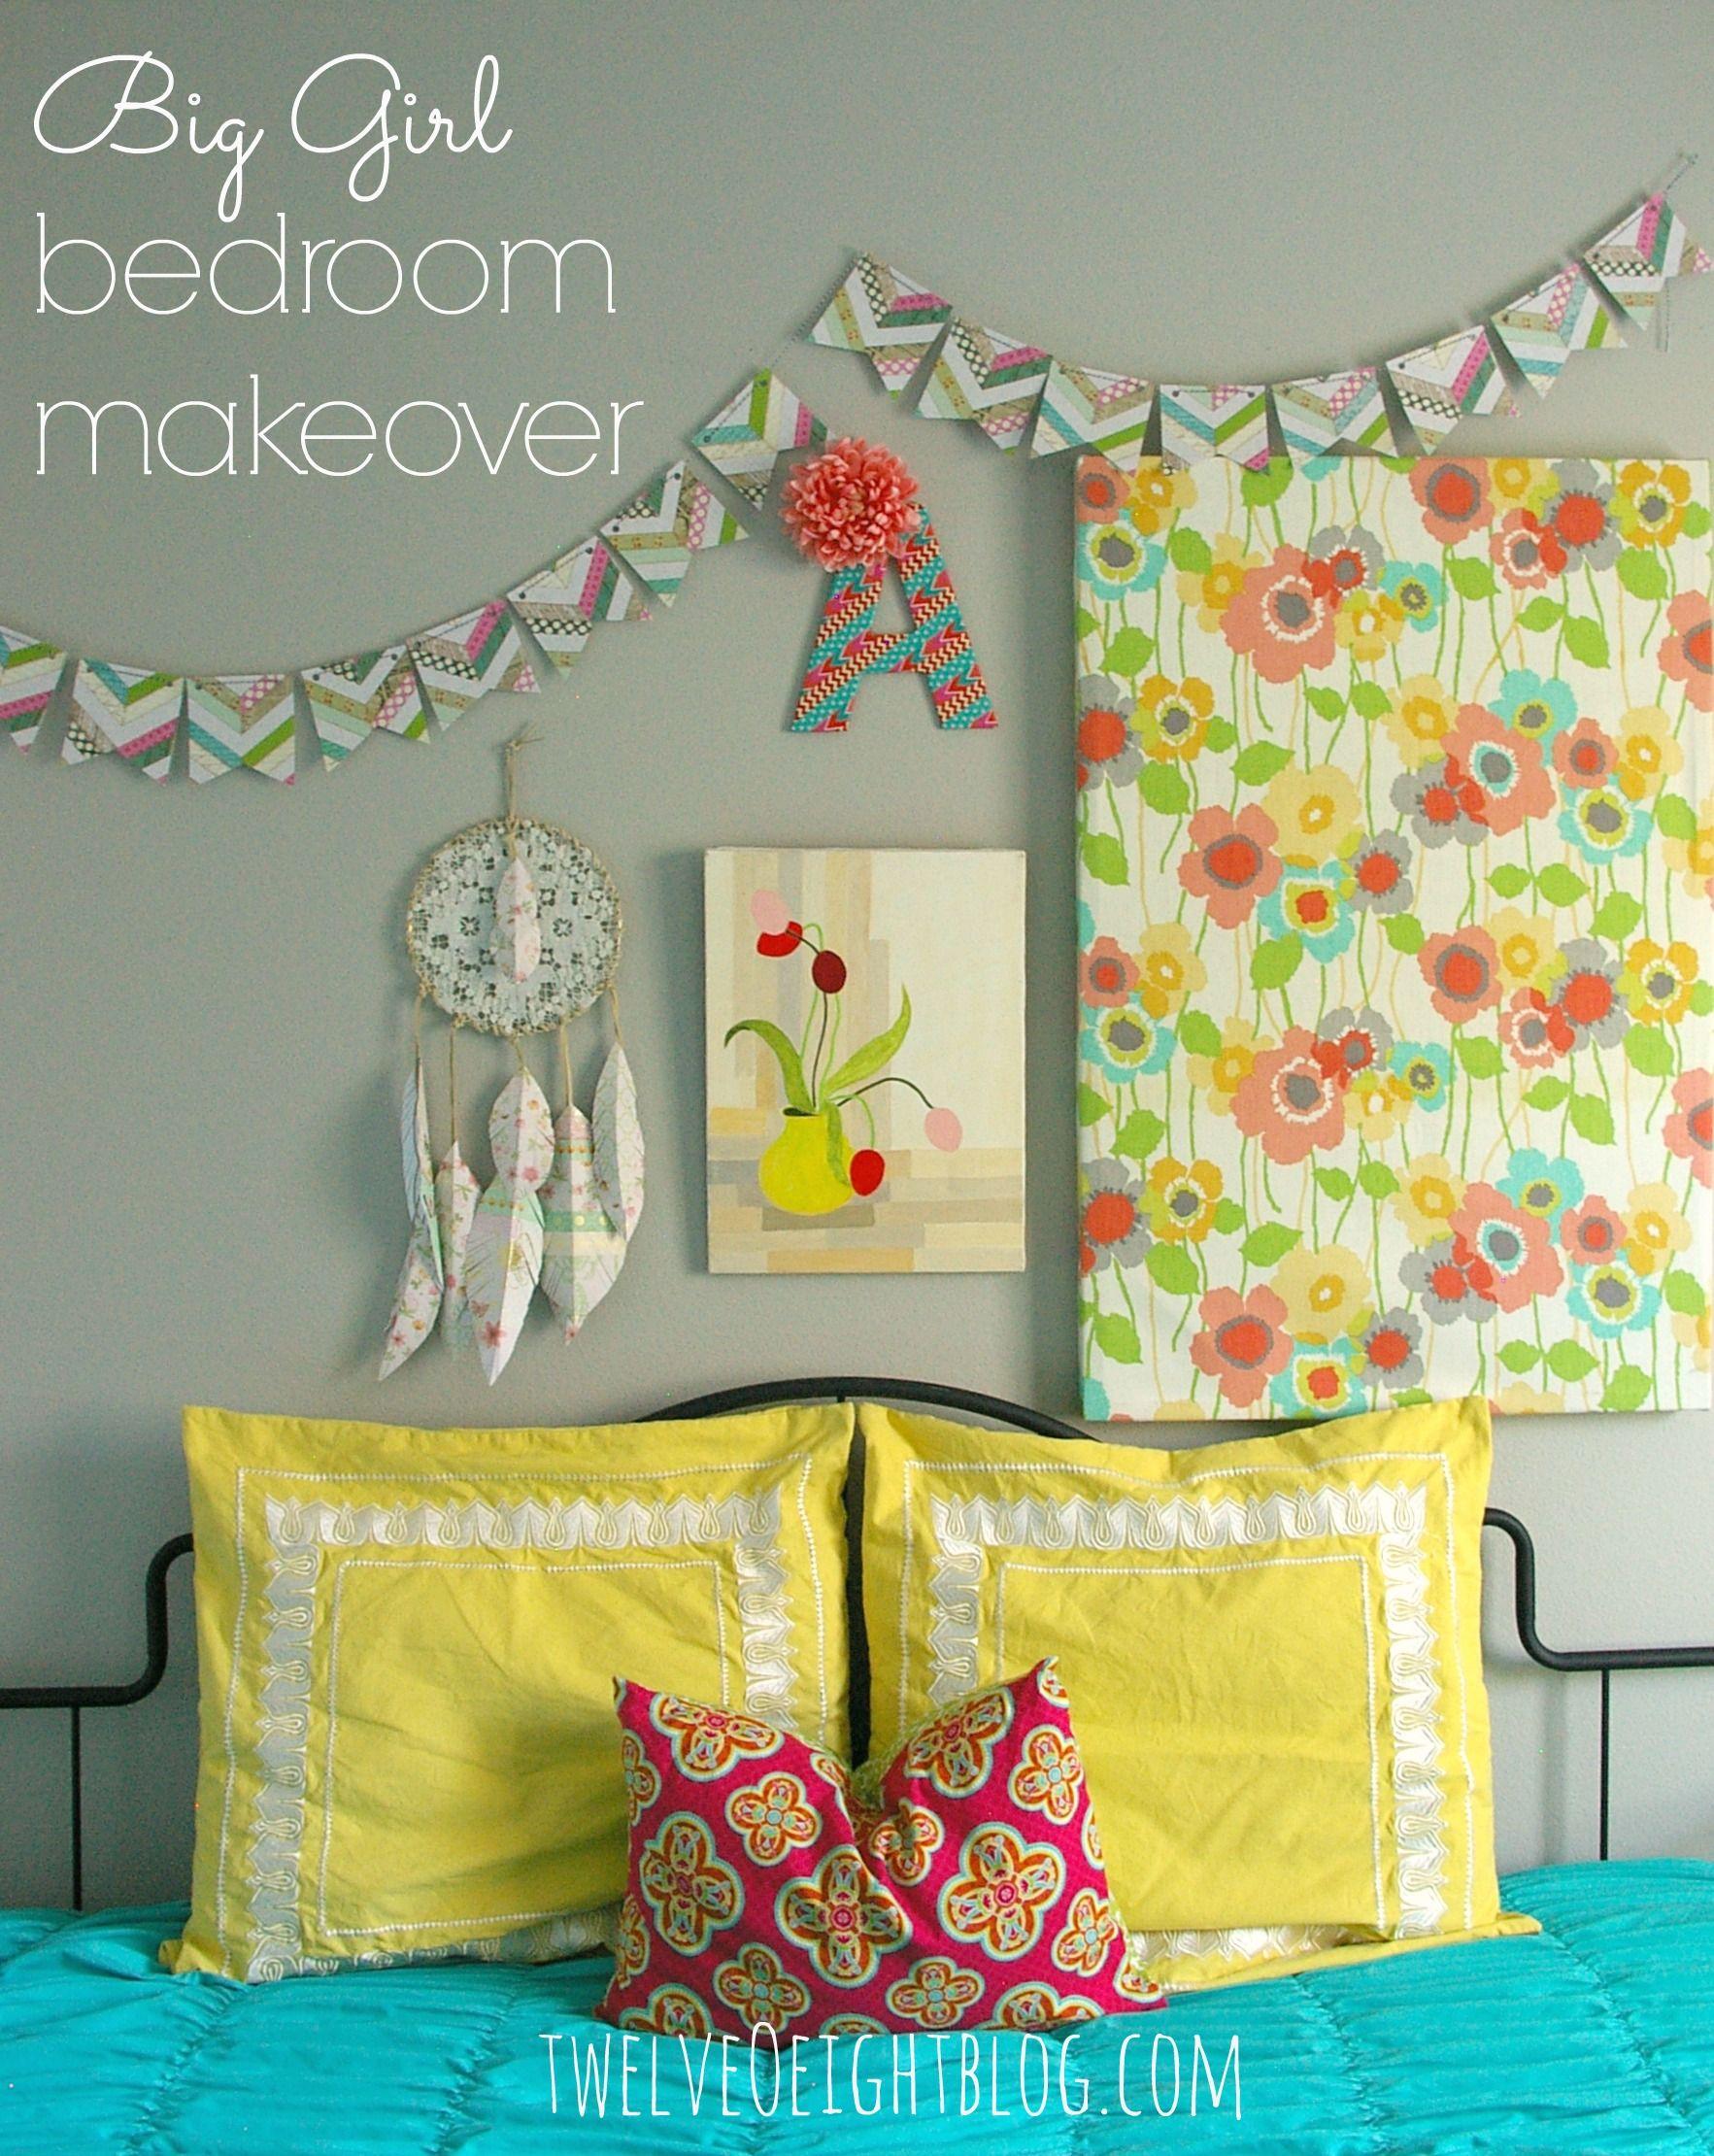 lemon yellow + hot pink + sea glass blue + grey walls   home etc ...